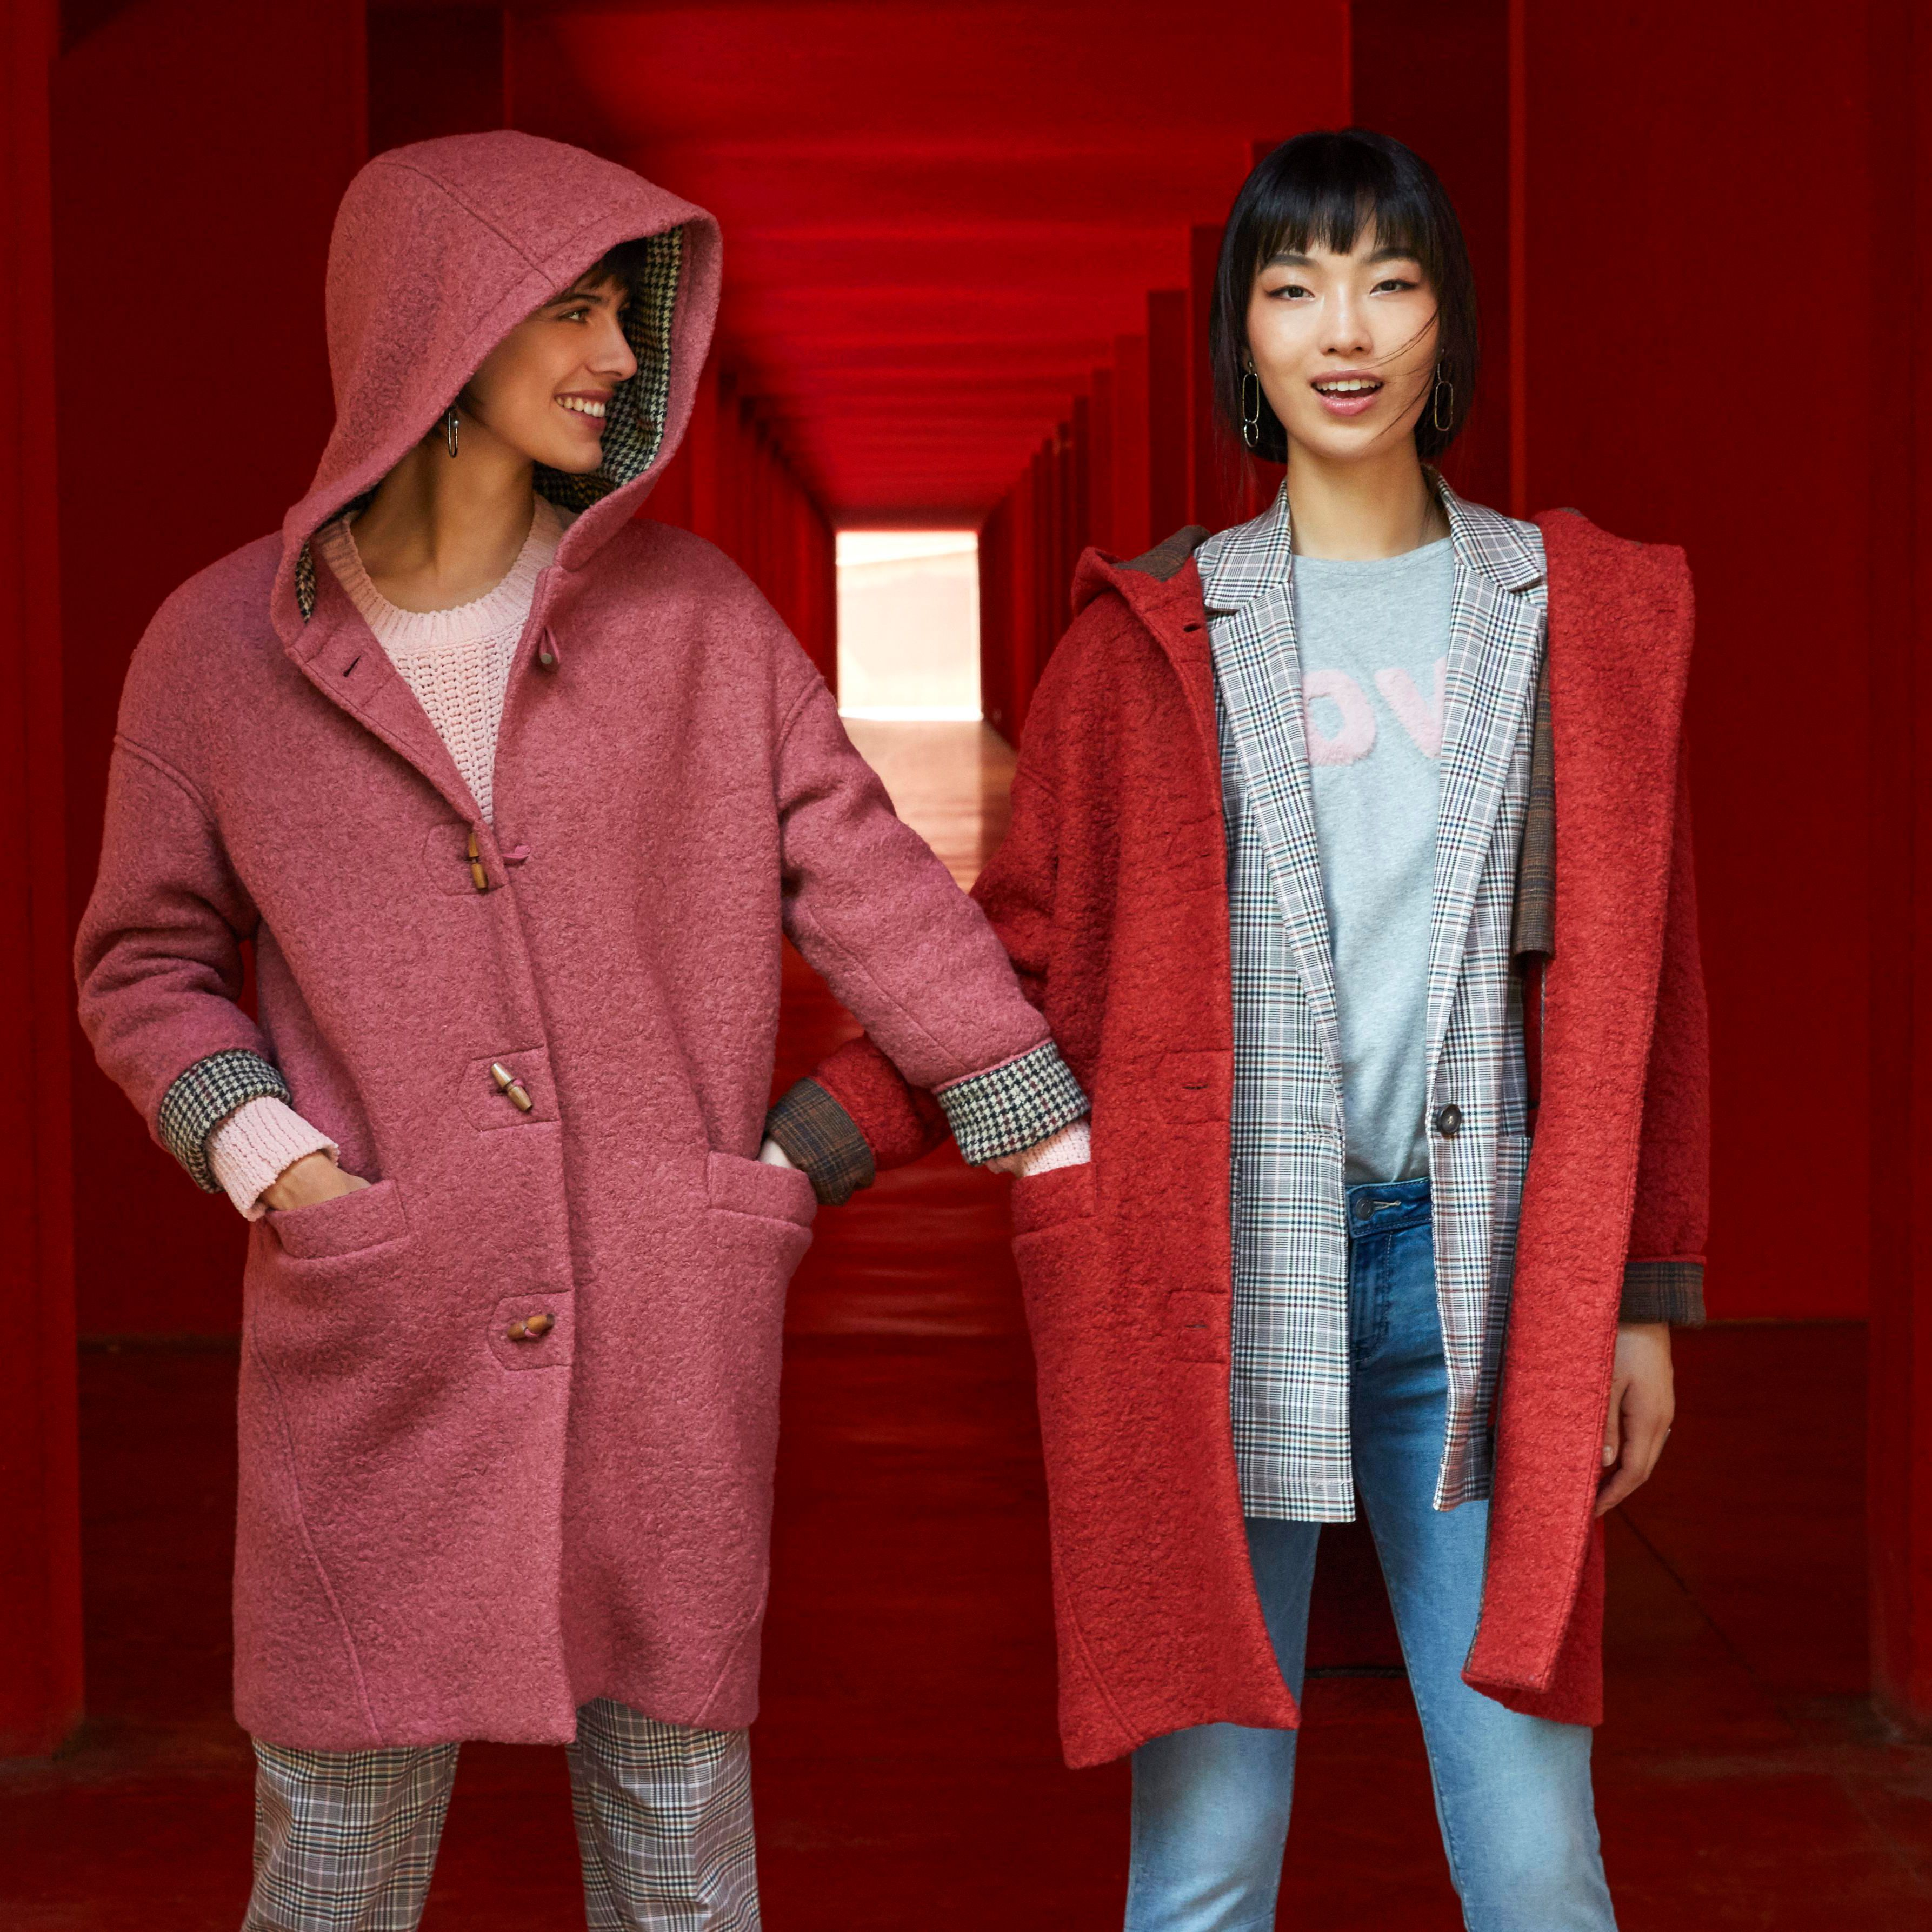 Esprit Outerwear Red Pink Coats Coats For Women Coat Casual Chic [ 3574 x 3574 Pixel ]